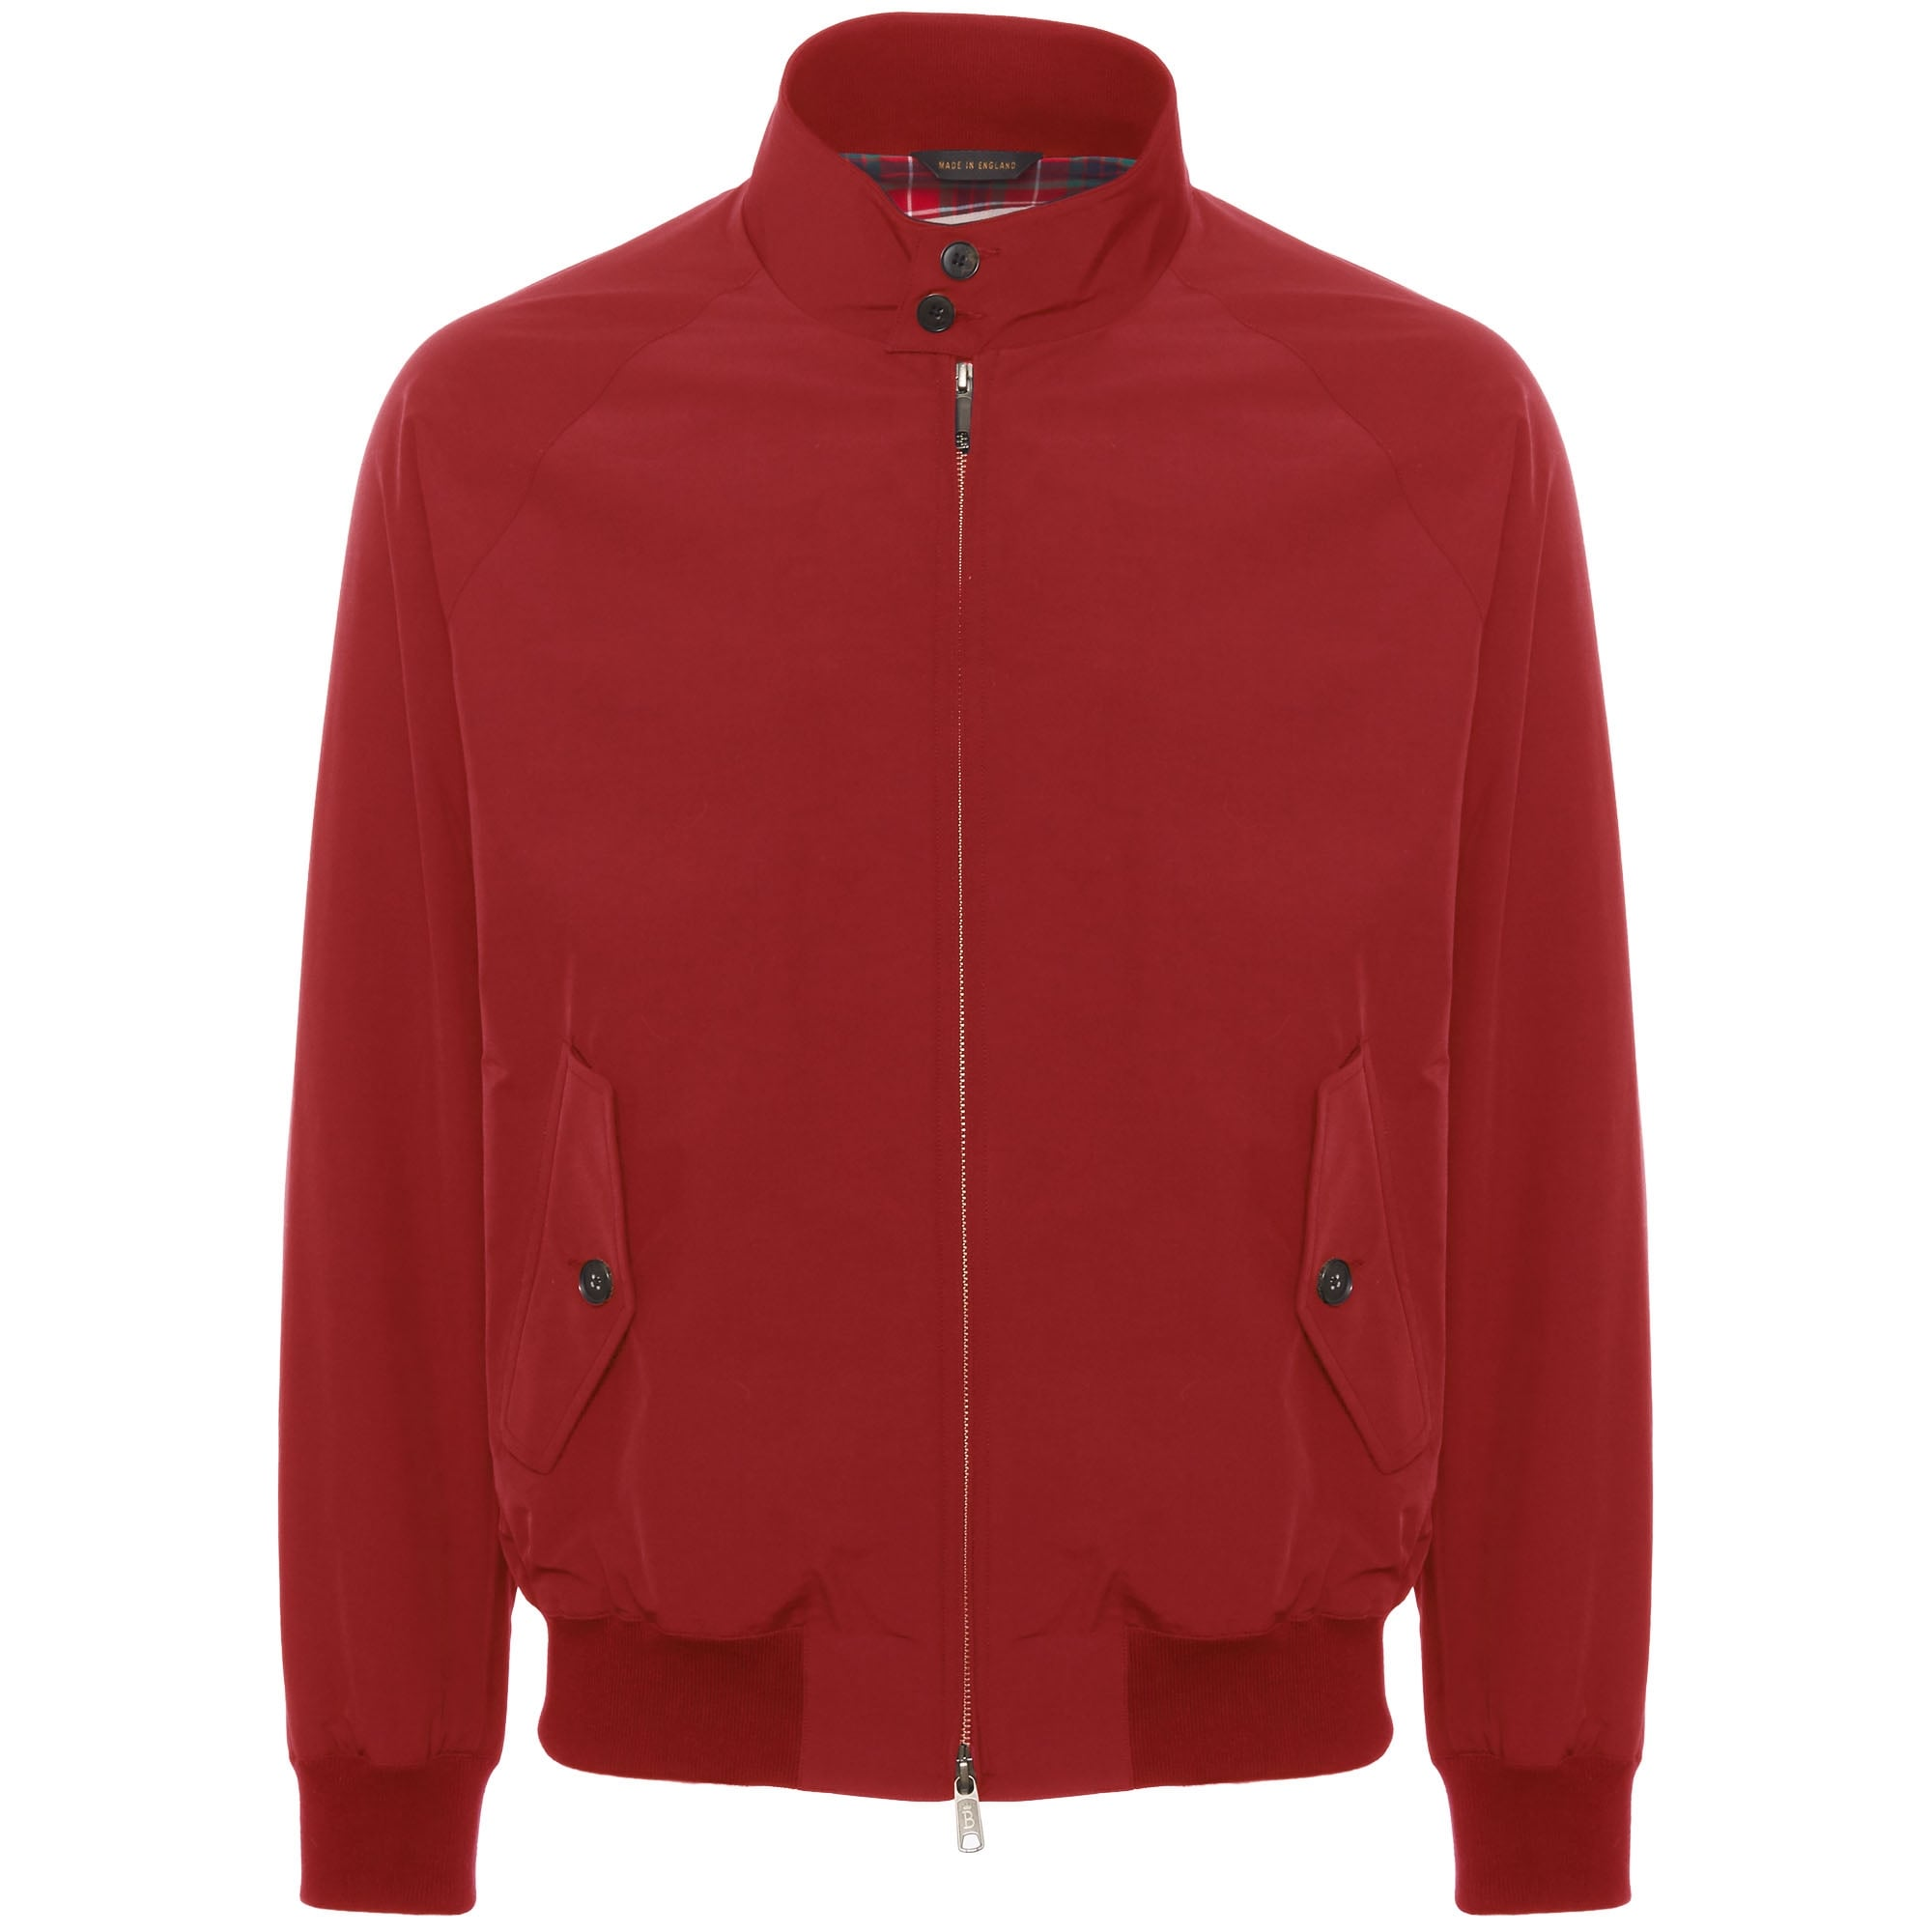 64619e7527d1a Baracuta G9 Modern Classic Harrington Jacket Dark Red